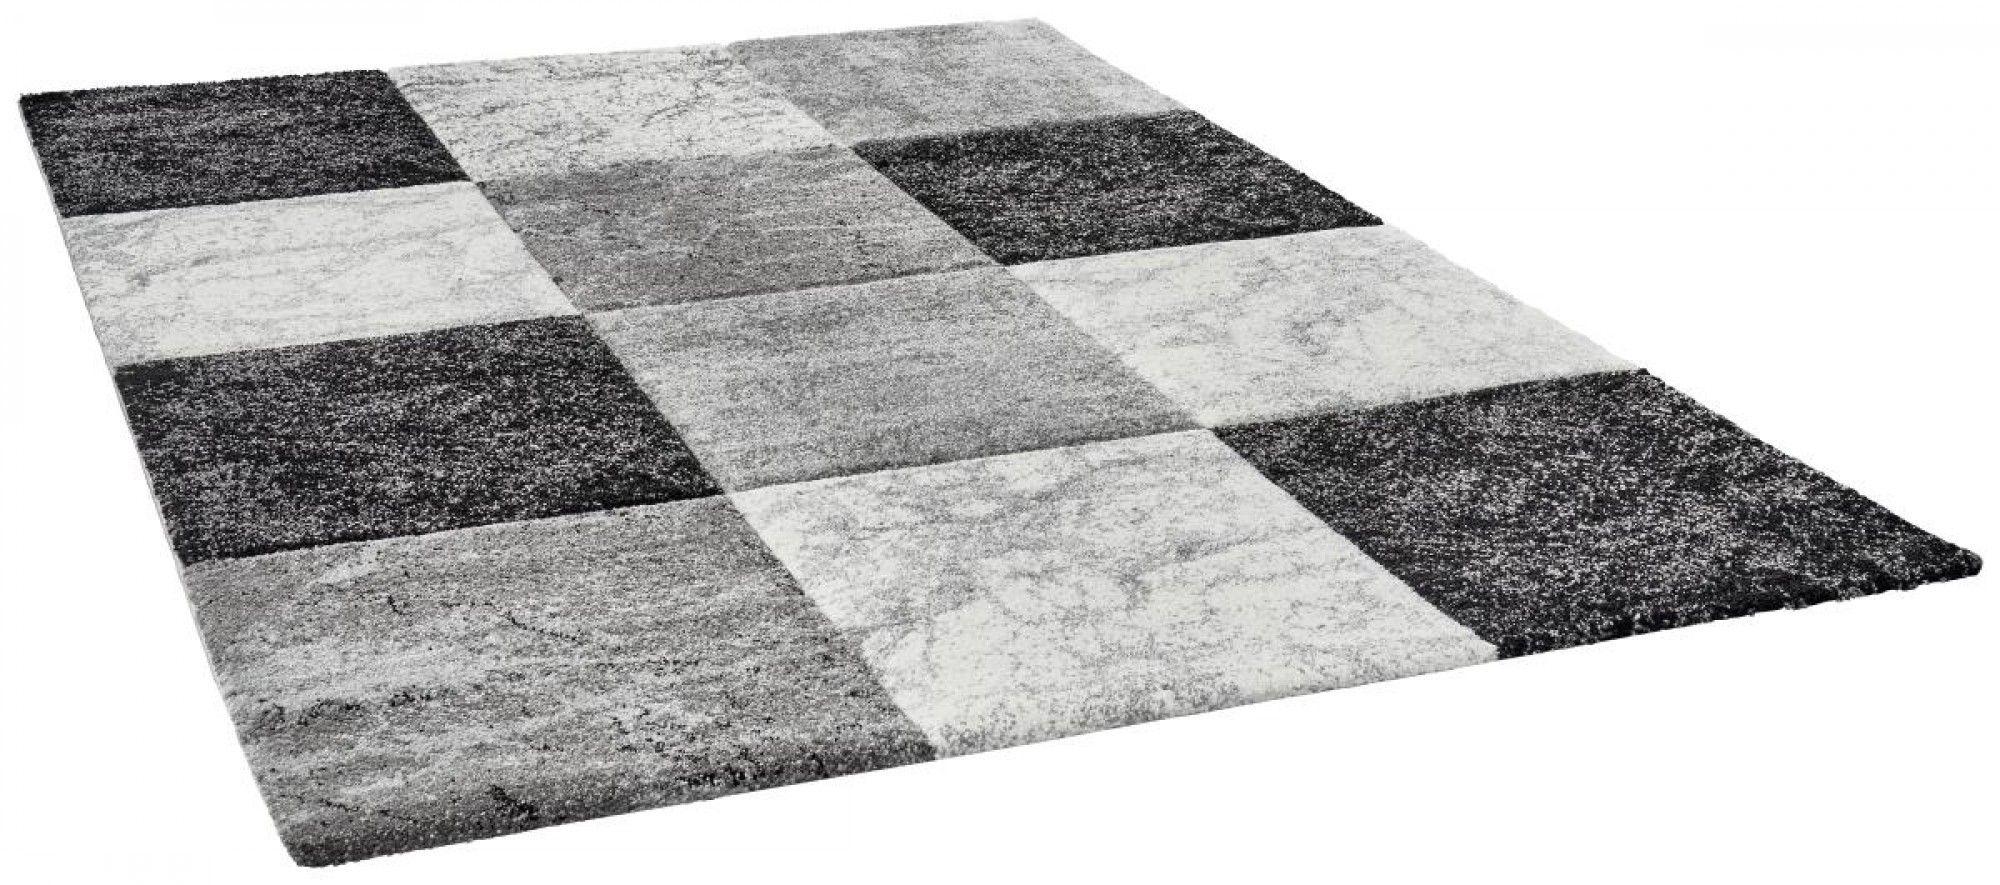 teppich sterne grau cool grau teppich mit sternen enorm lorena canals teppich sterne fur kinder. Black Bedroom Furniture Sets. Home Design Ideas